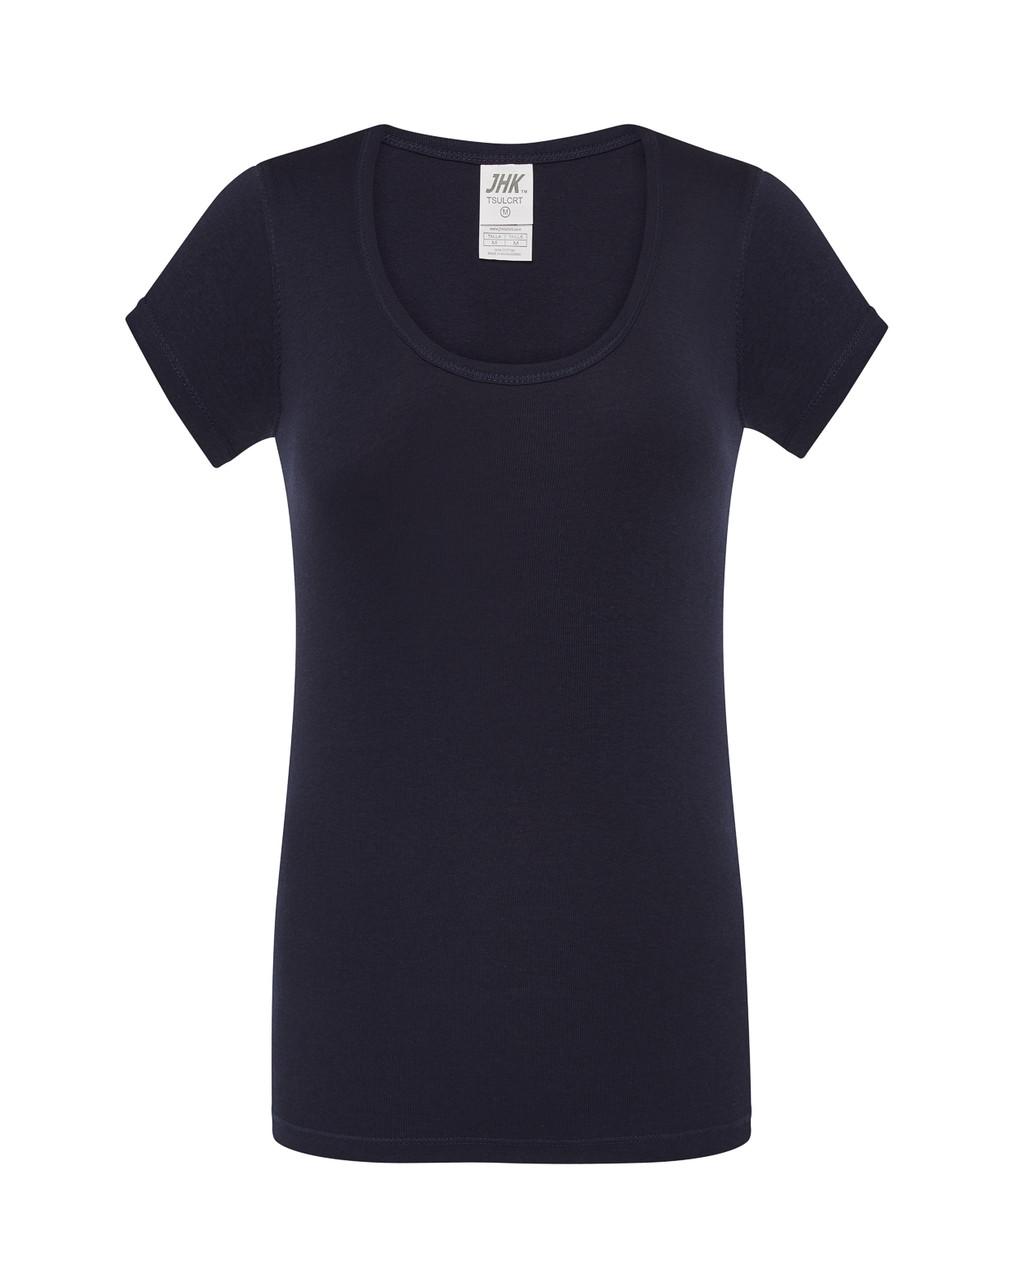 Женская футболка JHK CRETA цвет темно-синий (NY)